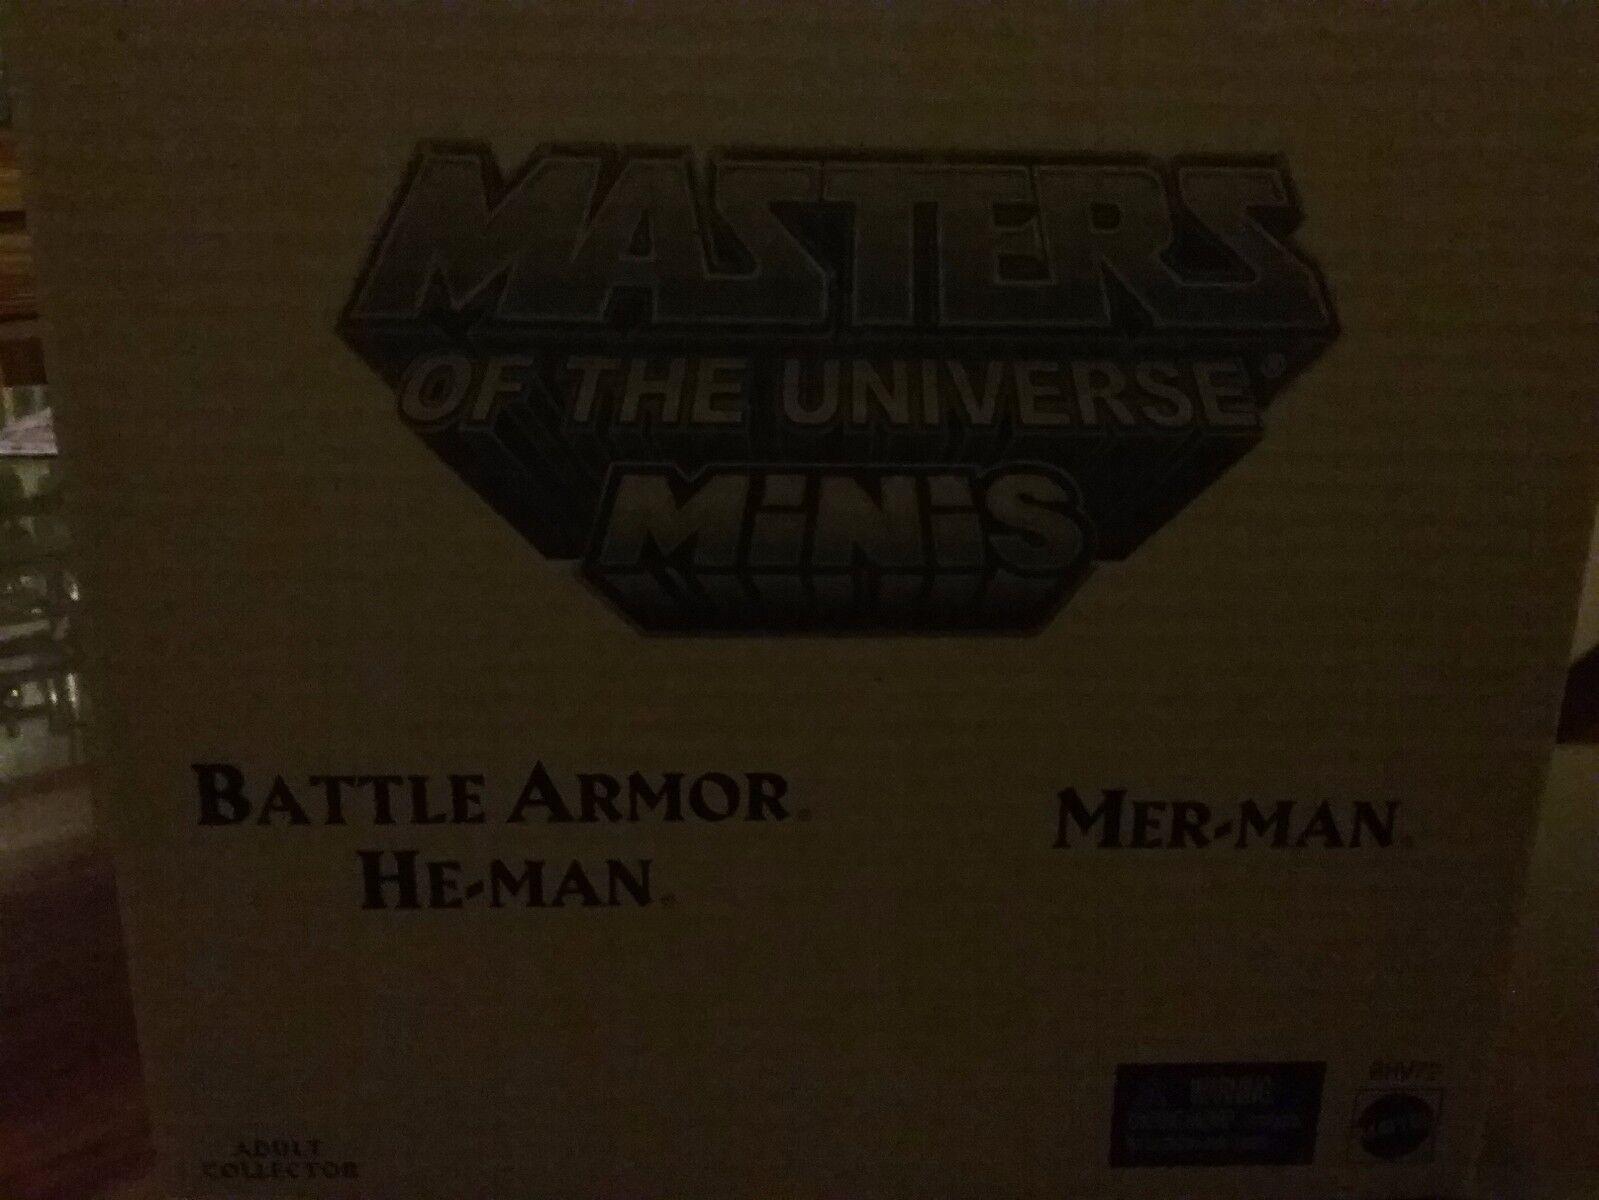 Mattel MOTU Minis Battle Armor He-man & Merman  NEW  Ship Worldwide